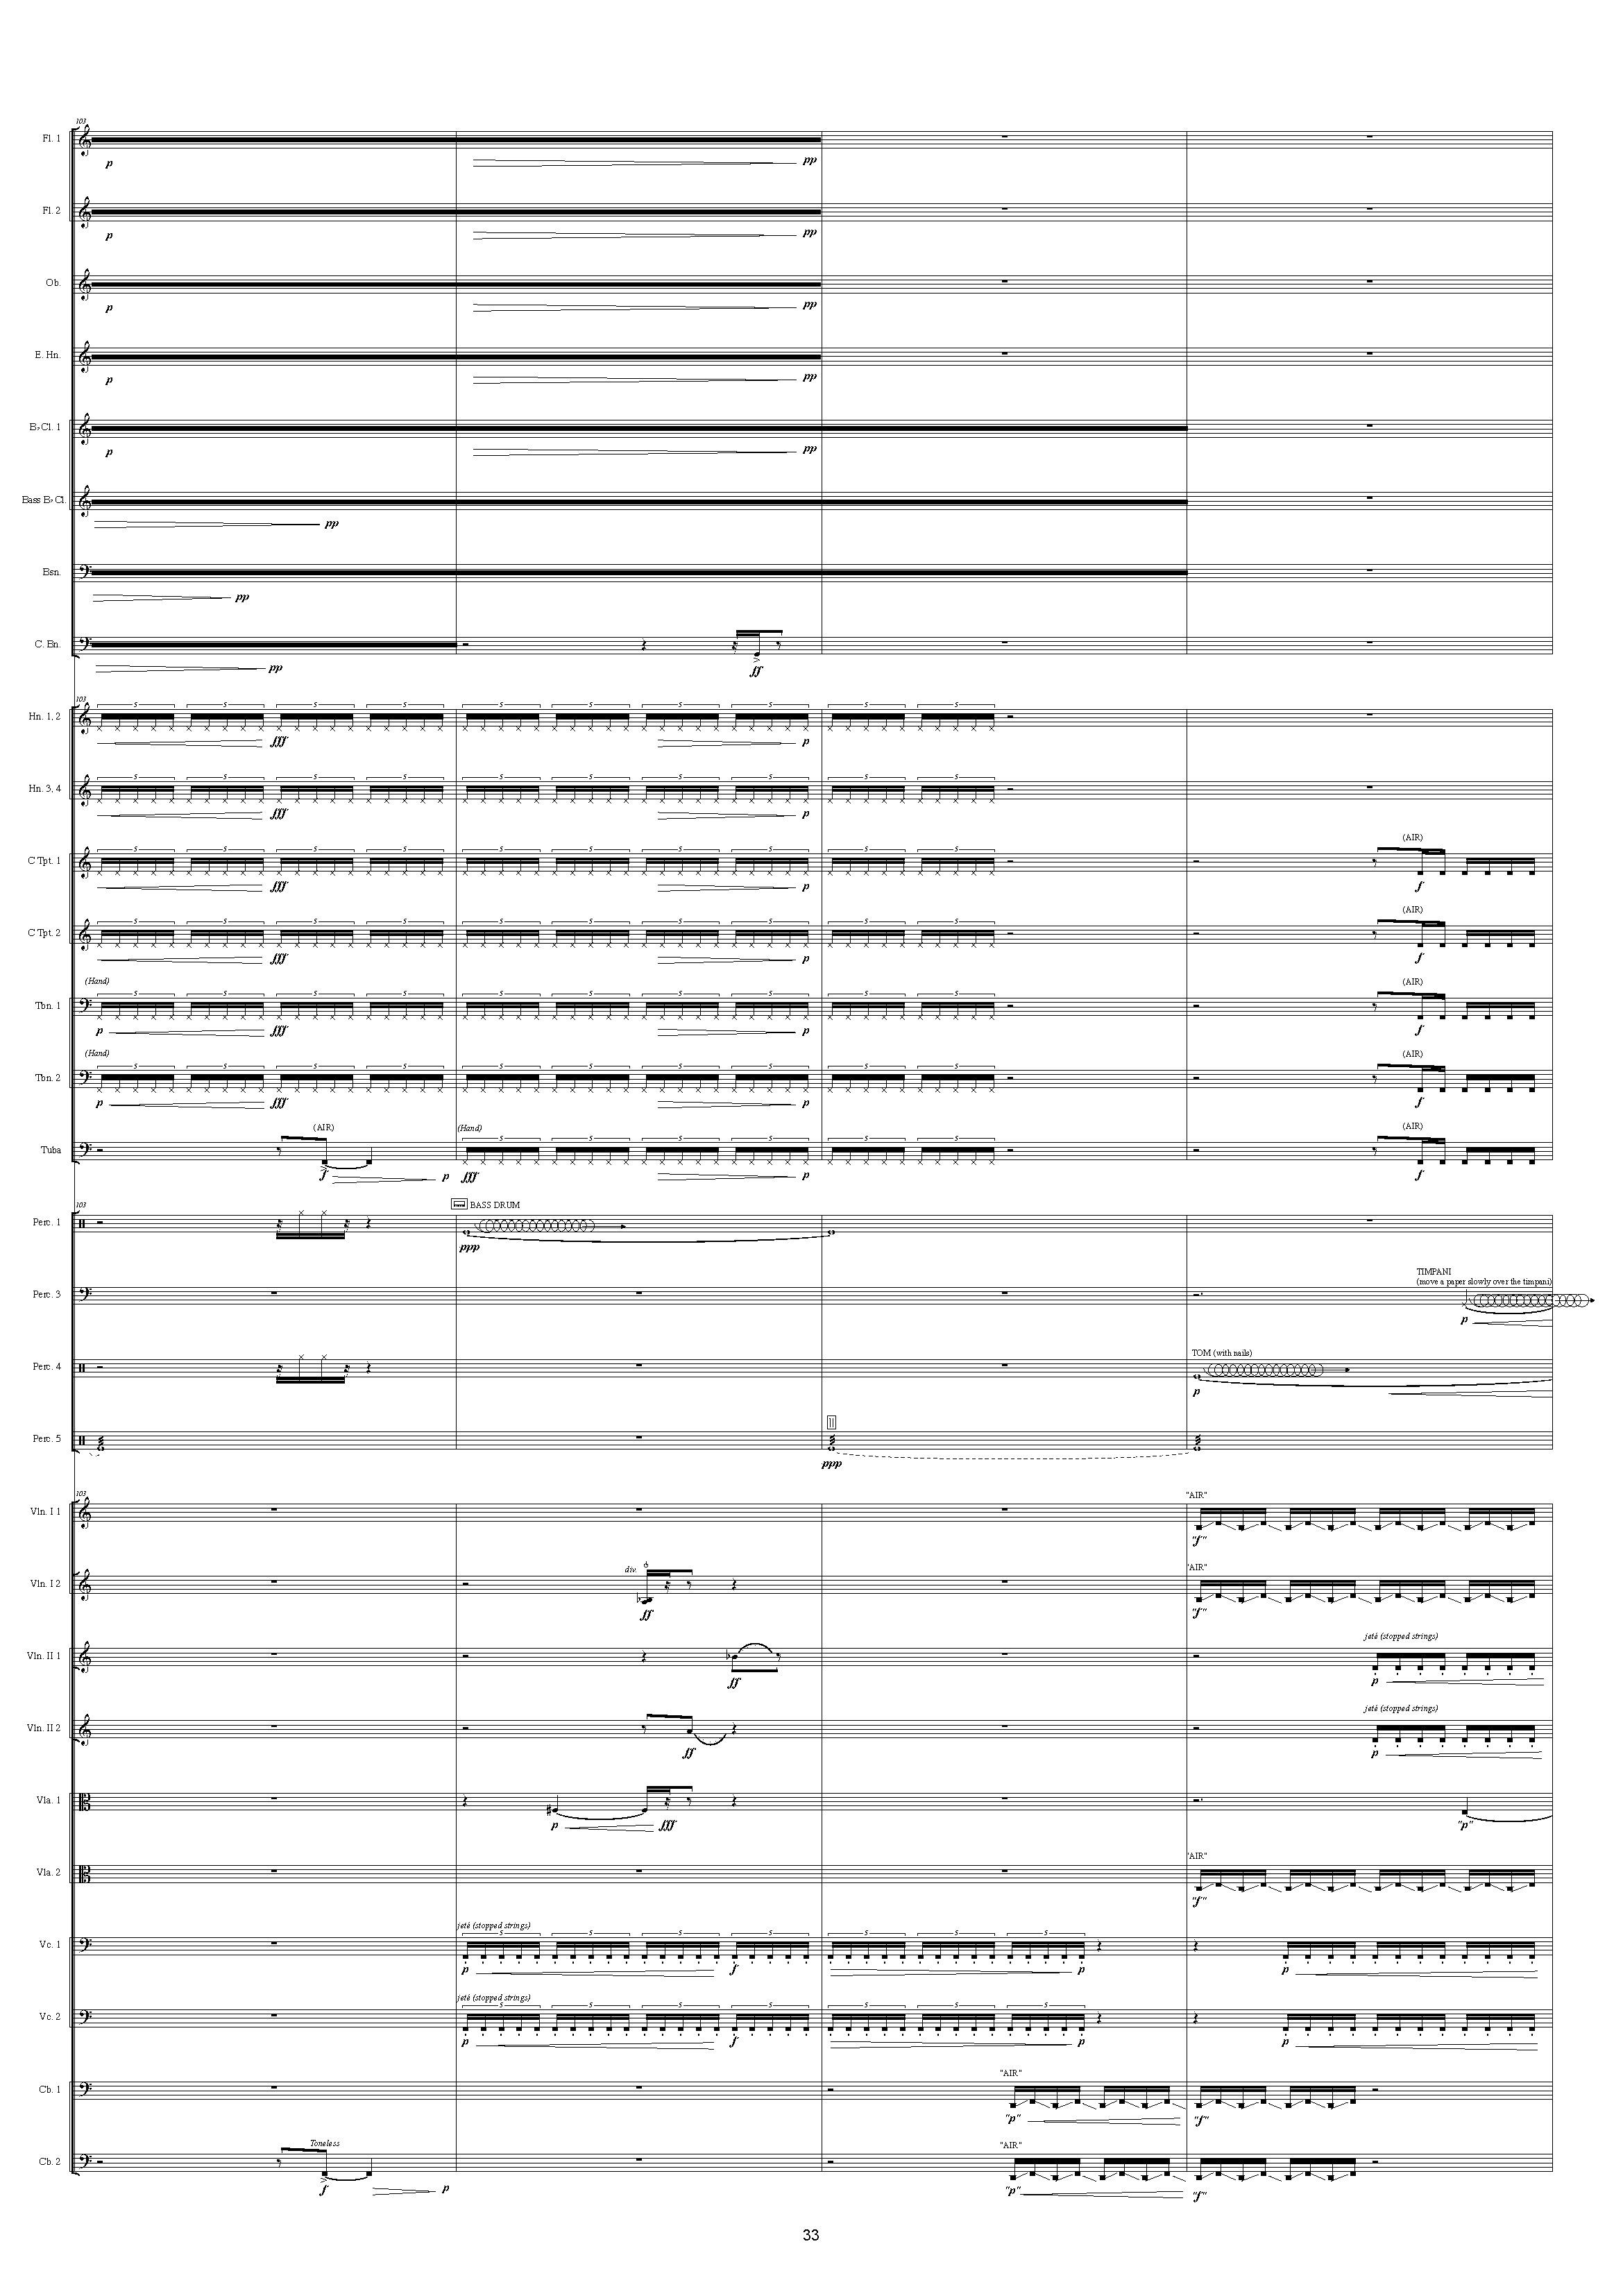 METANOIA_2009-RAPPOPORT_Seite_33.jpg